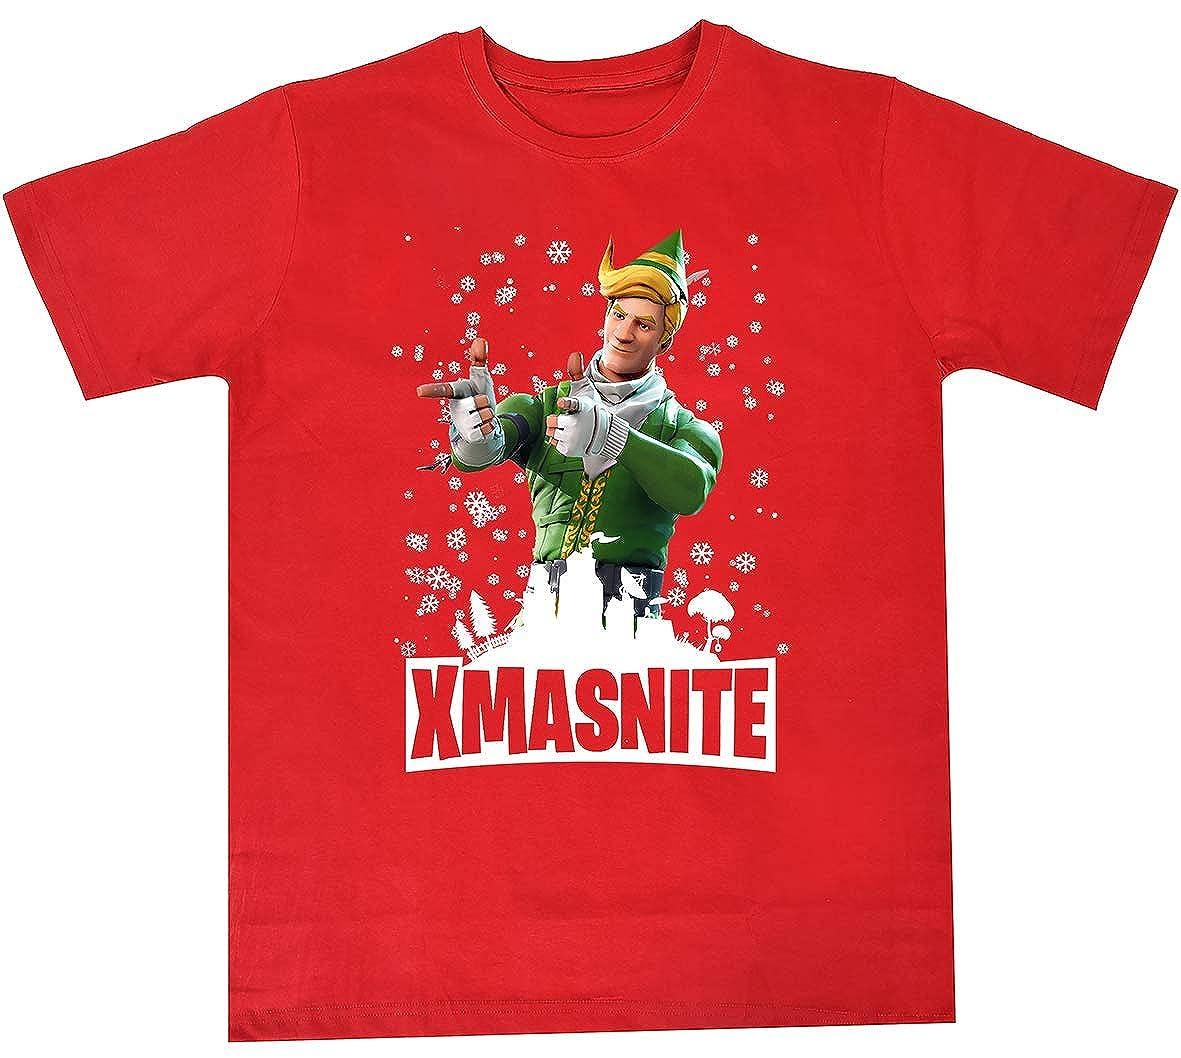 Fortnight T Shirt Kids, Fort, Youth Boys, Merchandise, Apparel, Sweatshirt, Ninja Shyper, Battle Royale, Christmas, Xmas, Nite Xmasnite04